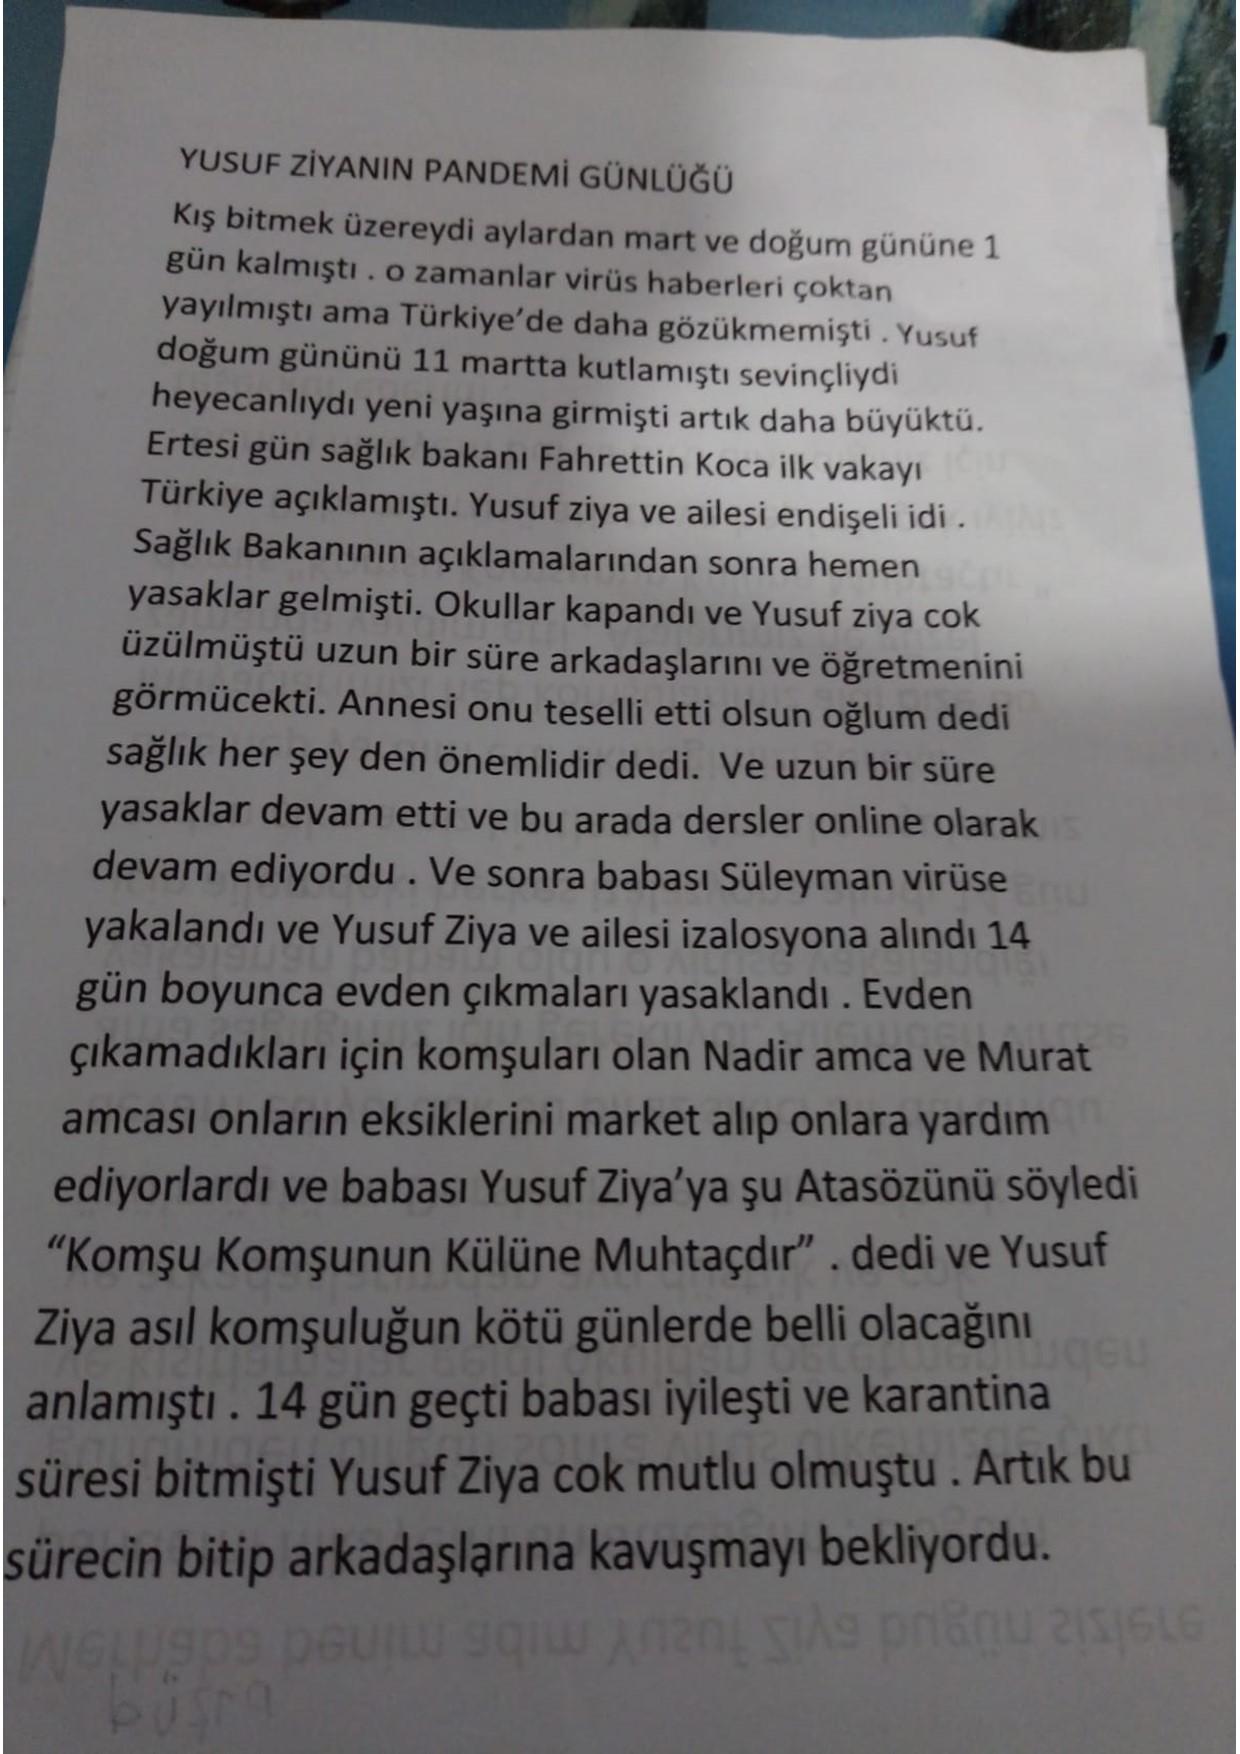 HİKAYE YAZMA by ramazan kılıç - Illustrated by HİKAYE YAZMA  - Ourboox.com